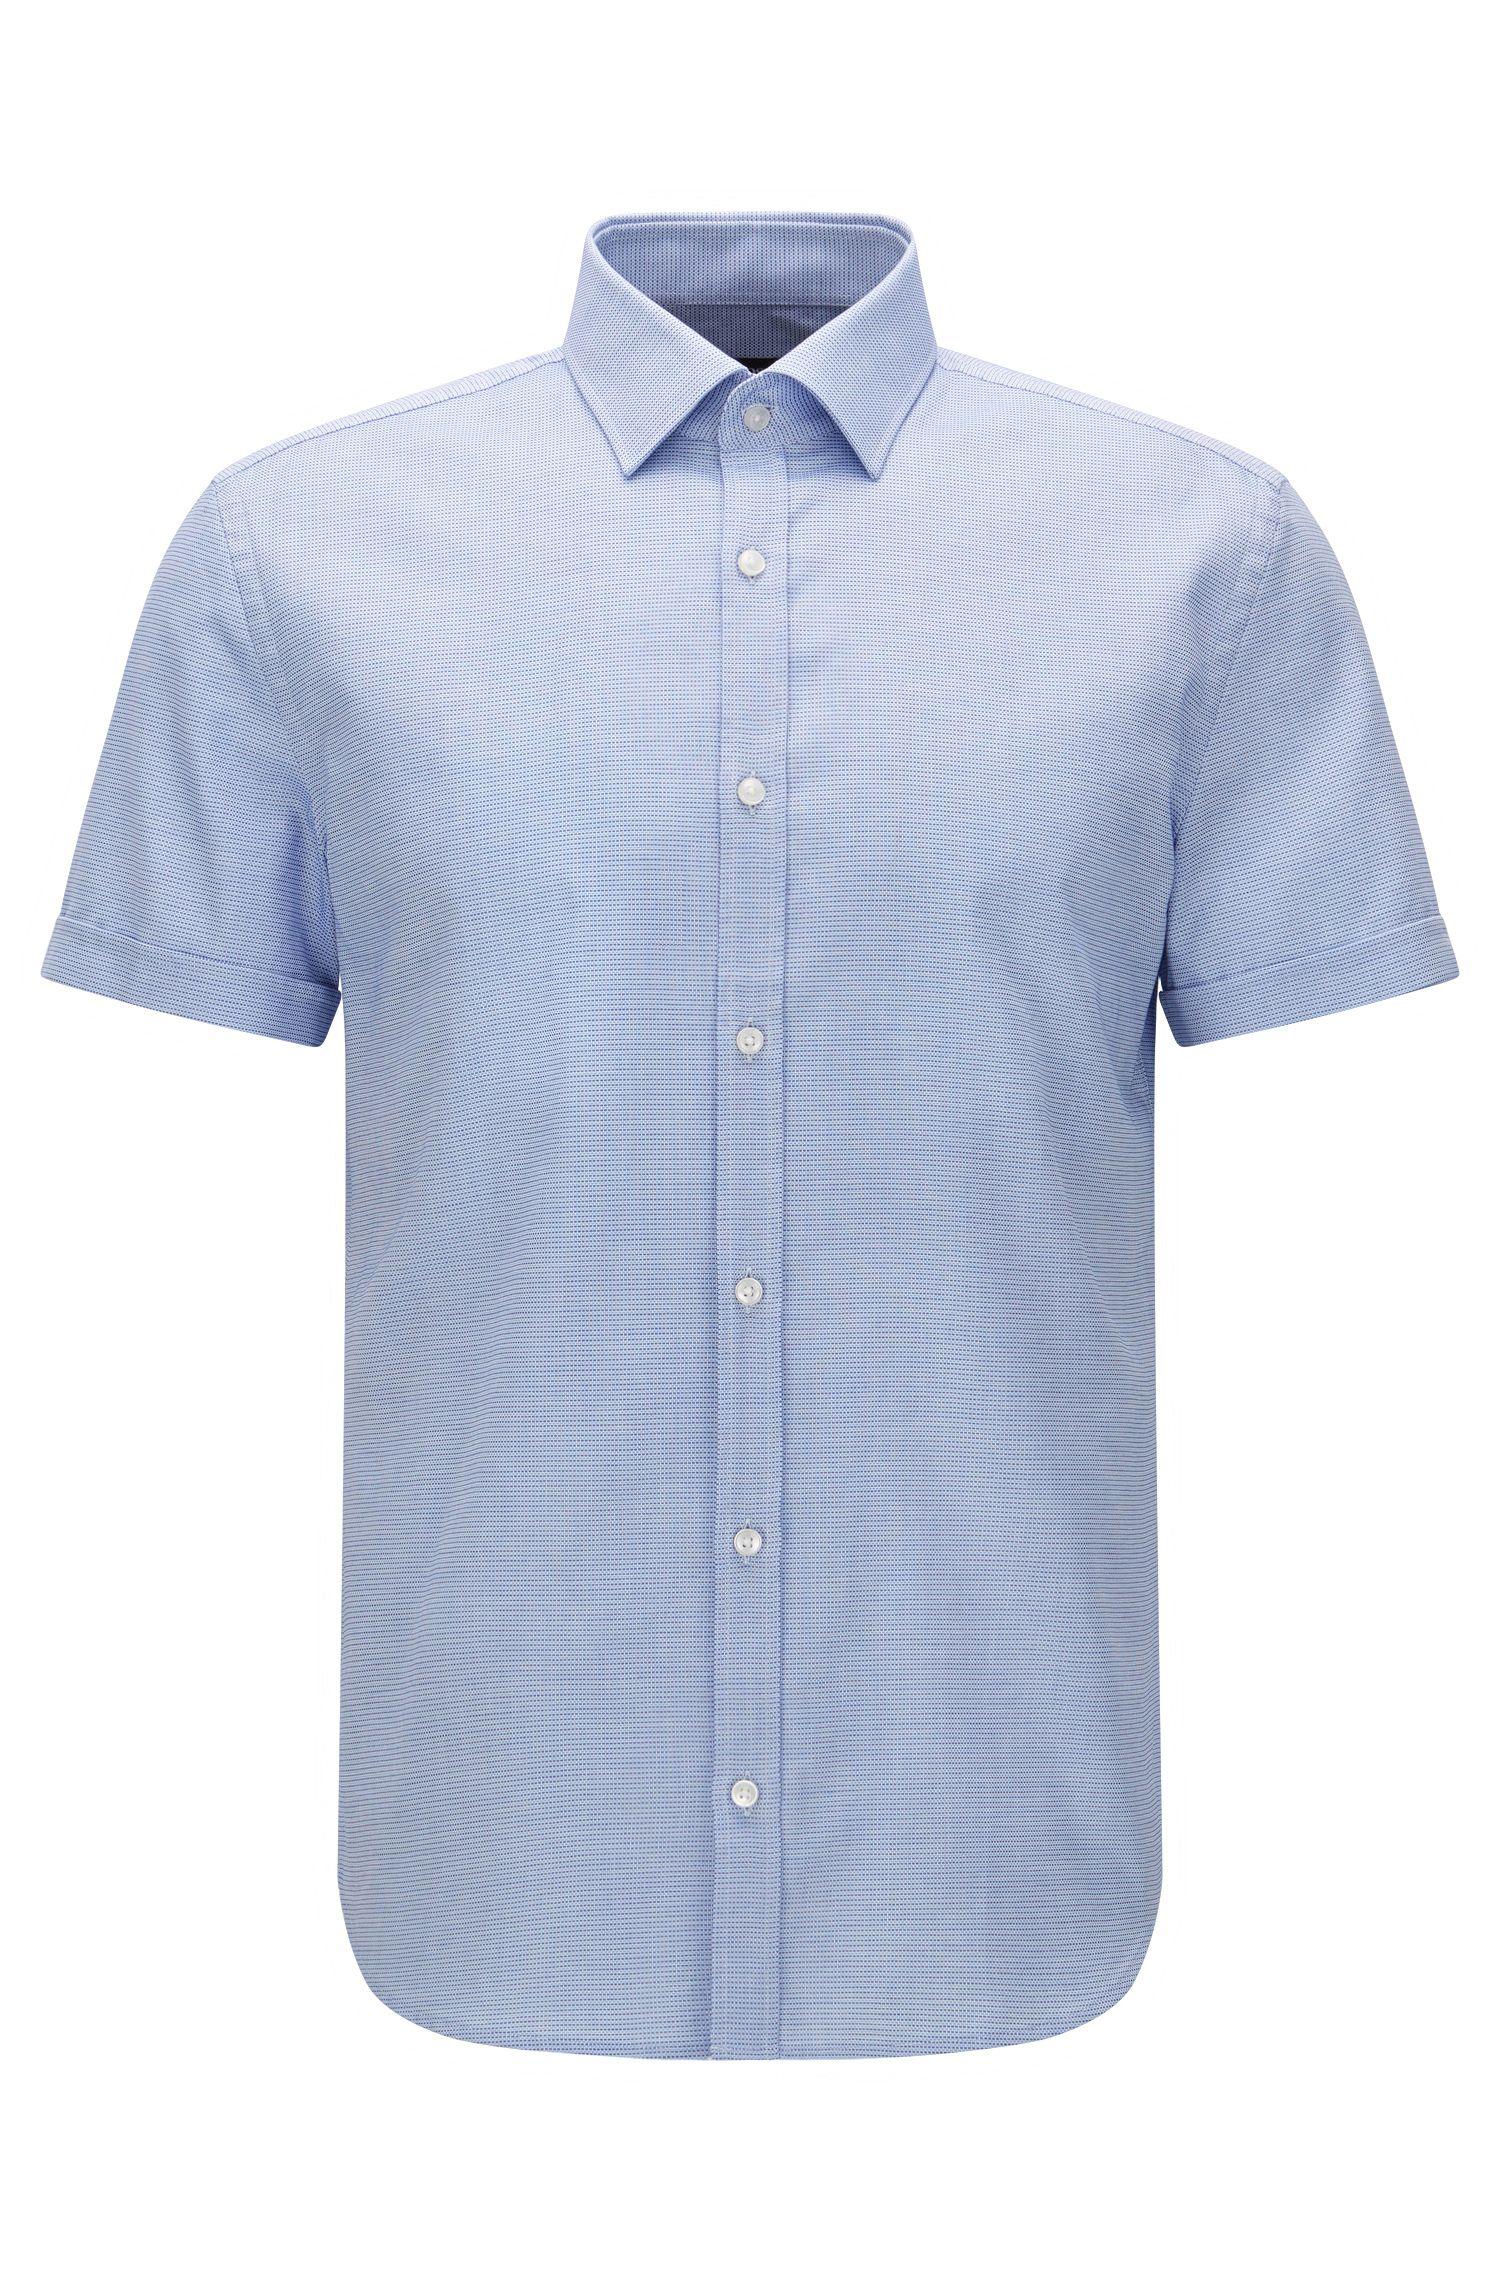 Patterned slim-fit short-sleeved shirt in cotton: 'Jats'